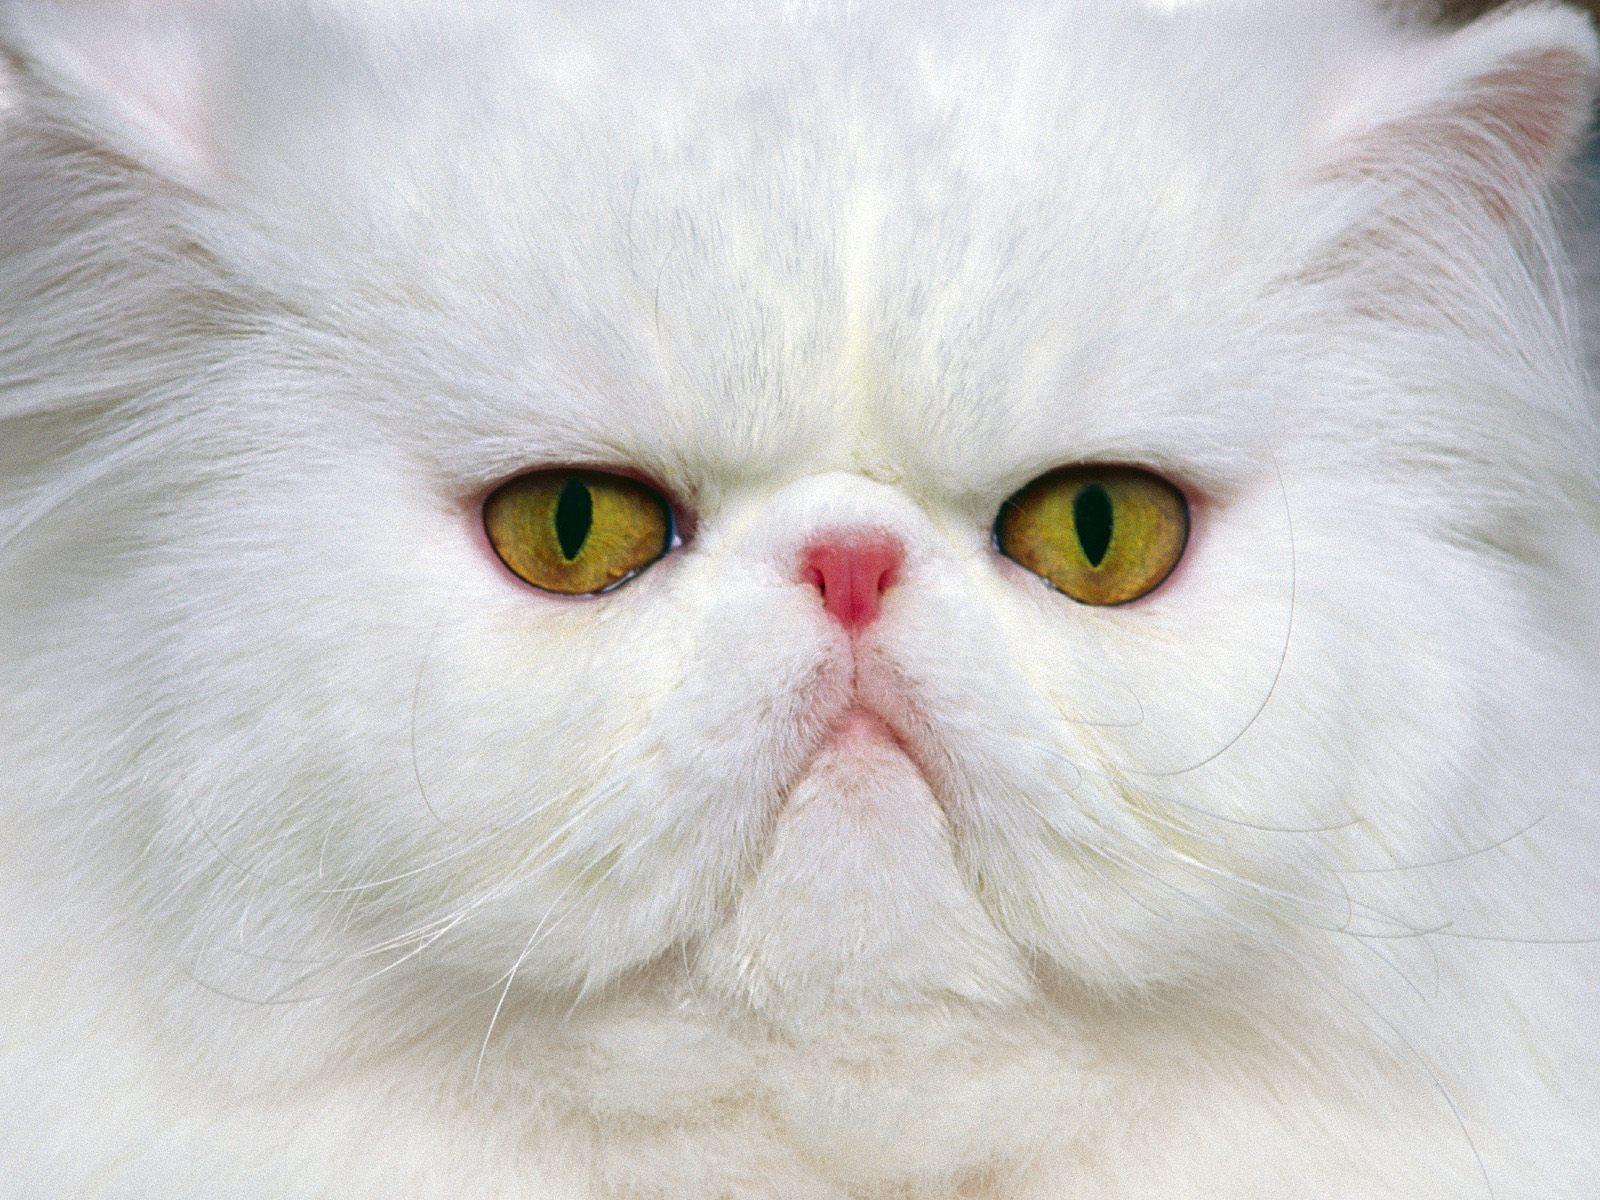 Unduh 97+  Gambar Kucing Persia Yg Lucu Terbaru HD